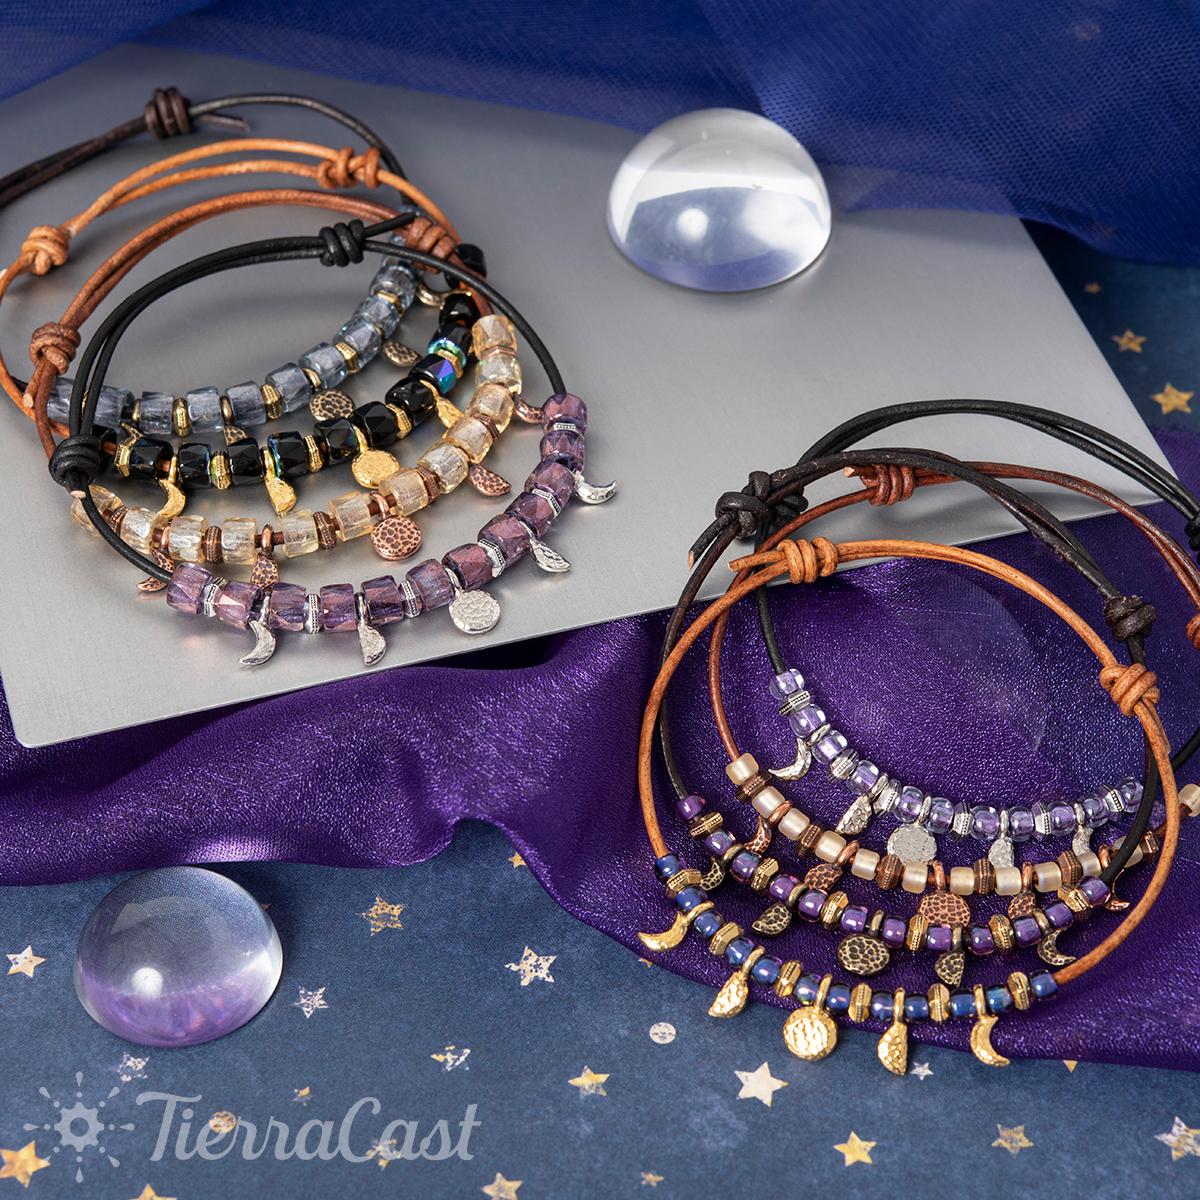 moon-phases-bracelets-1200px-w.logo.jpg